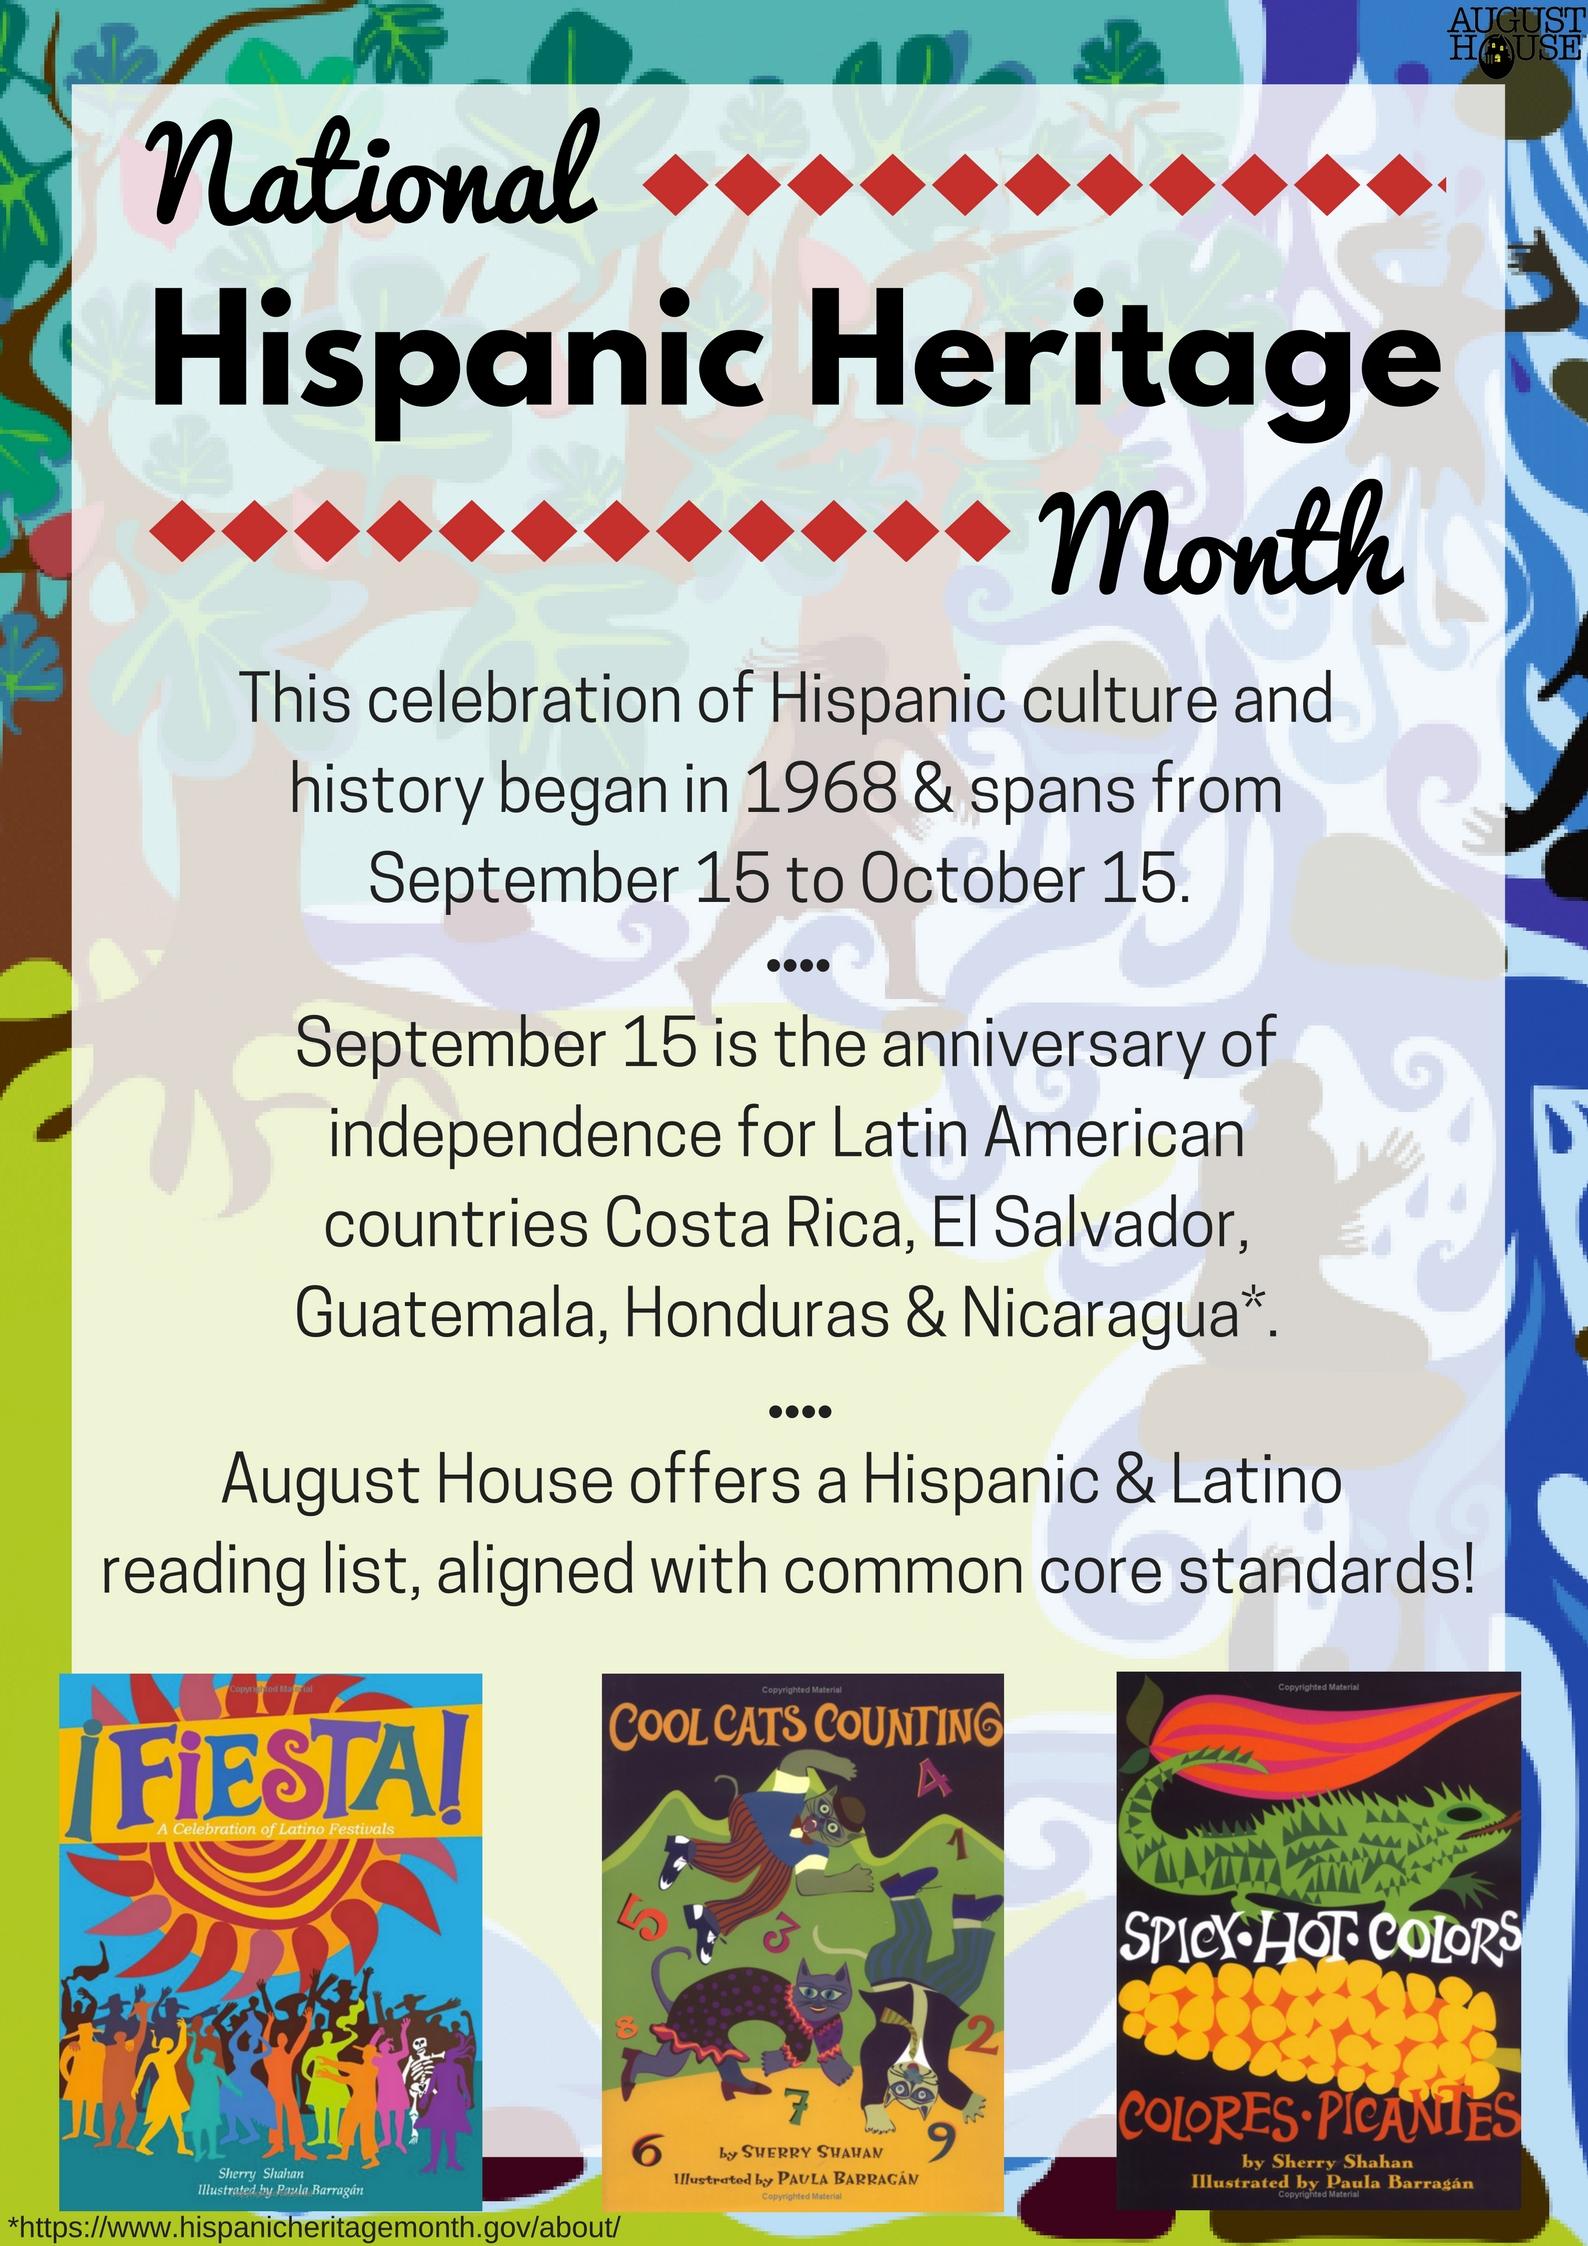 hispanic heritage month flyer